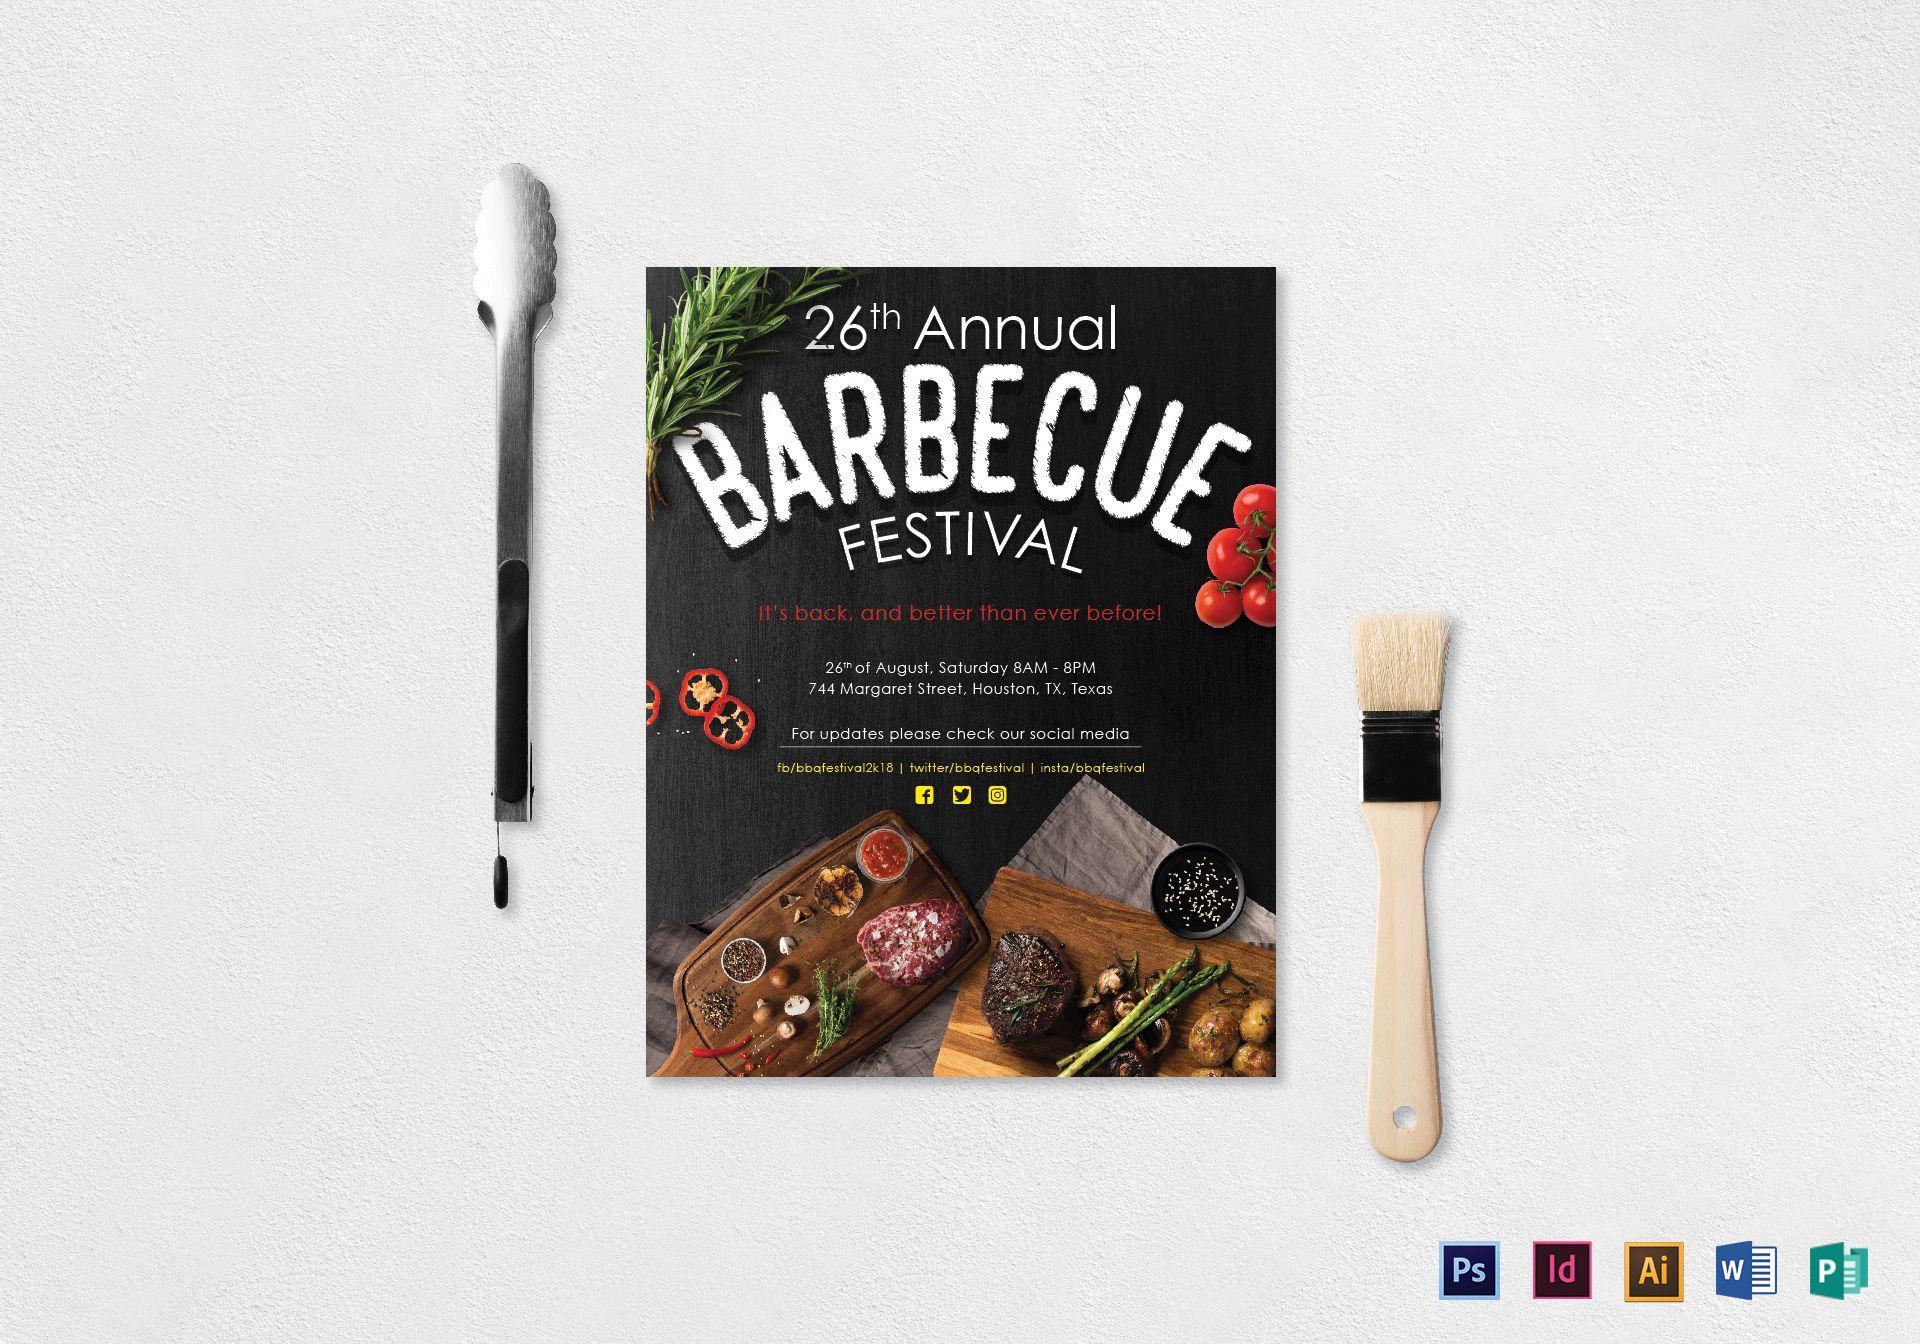 Annual BBQ Festival Flyer Template